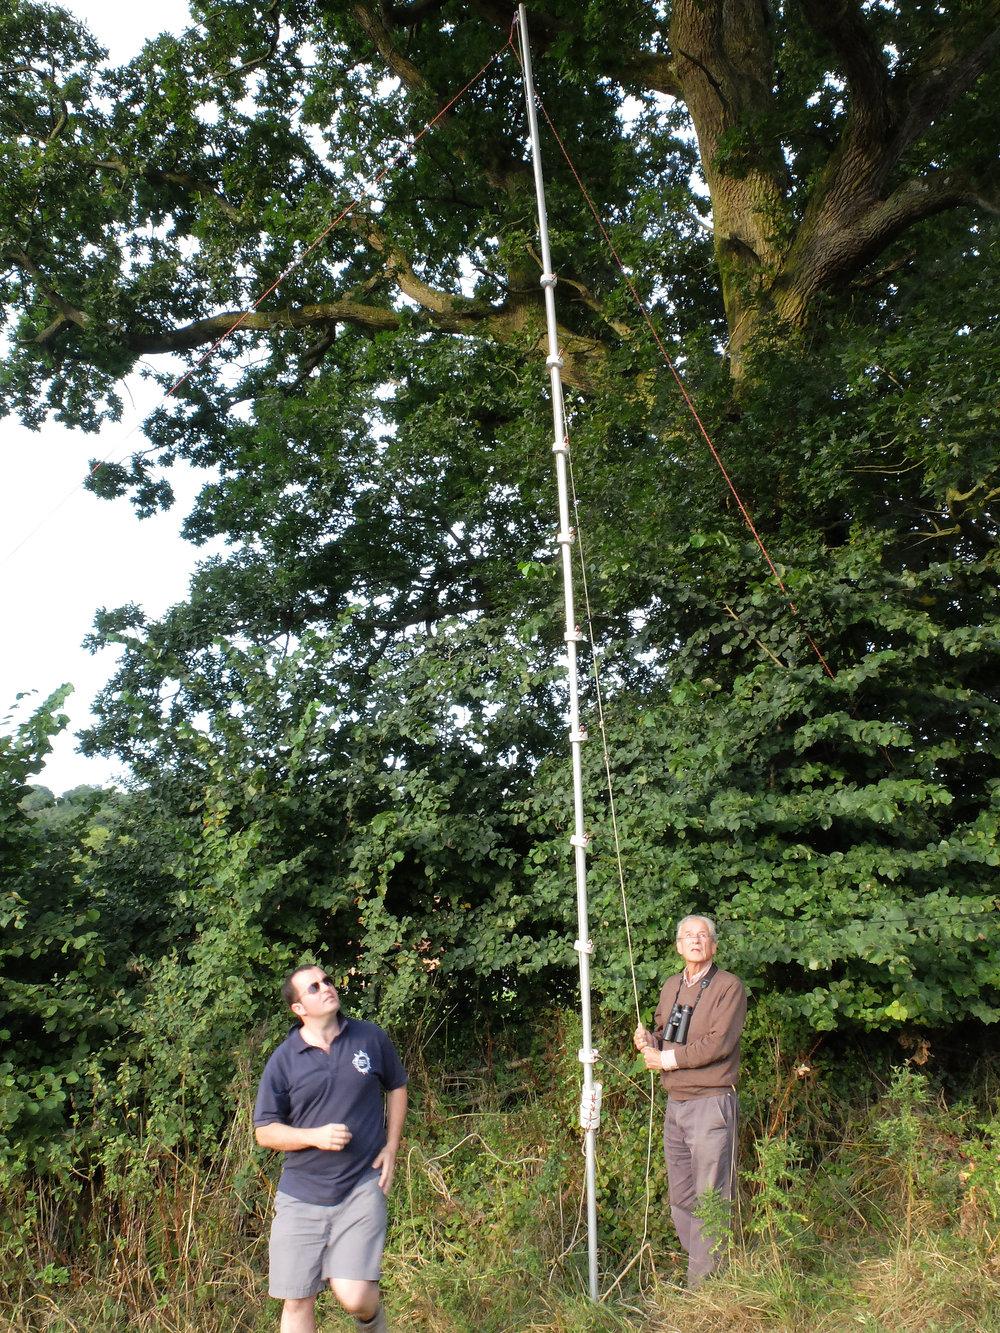 Erecting the Triple High net